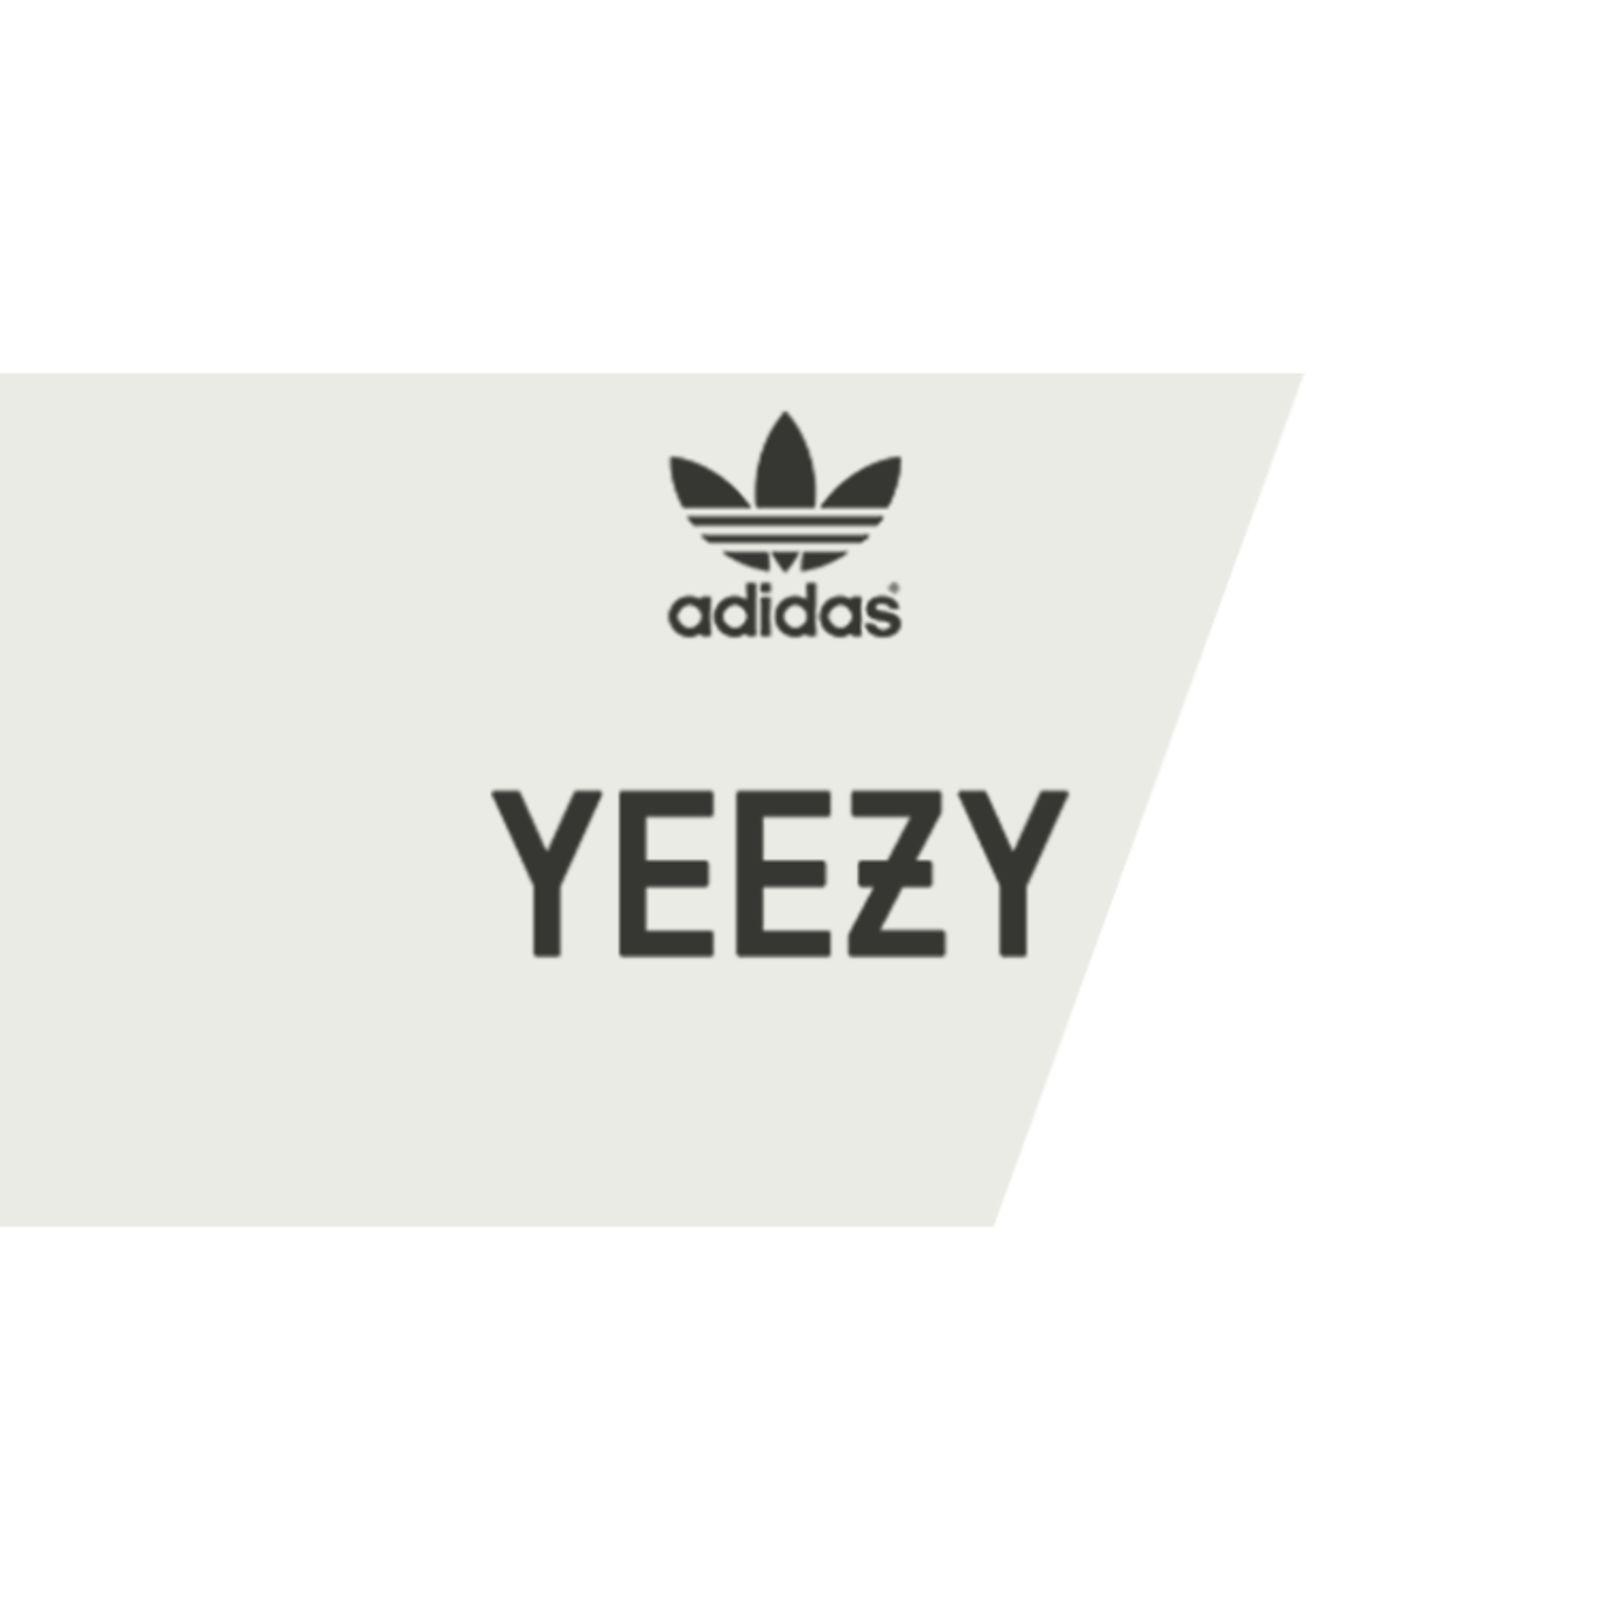 YEEZY adidas Originals x Kanye West